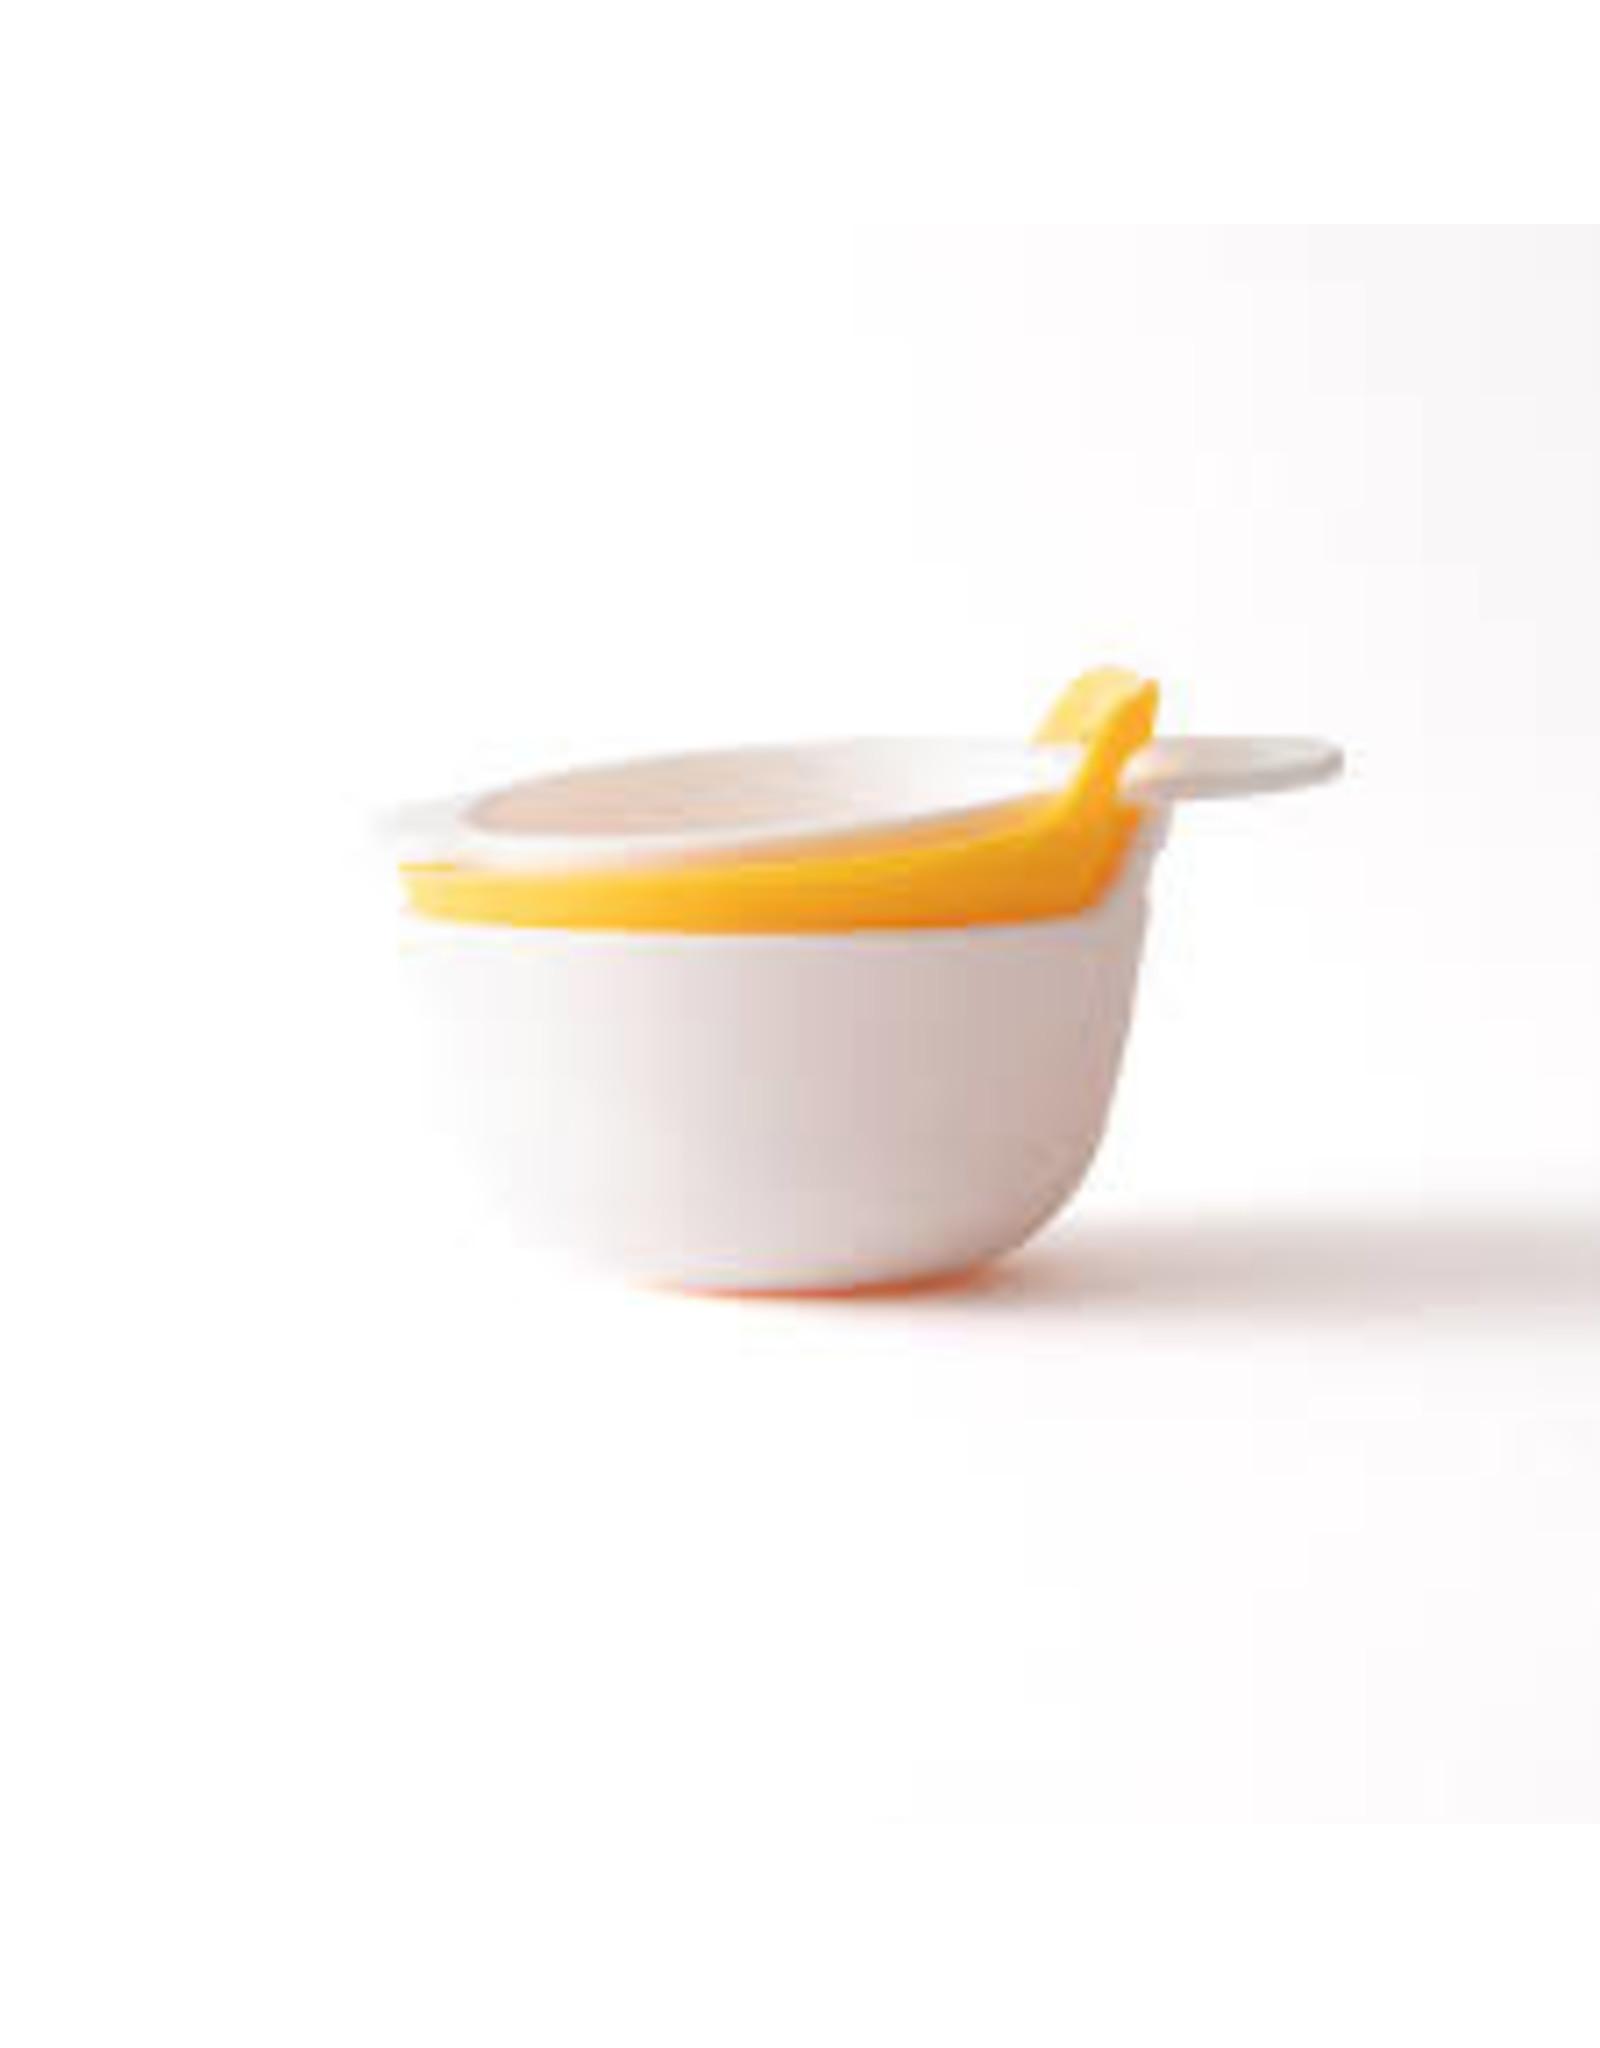 CHEF'N Poachster Perfect Egg Poacher